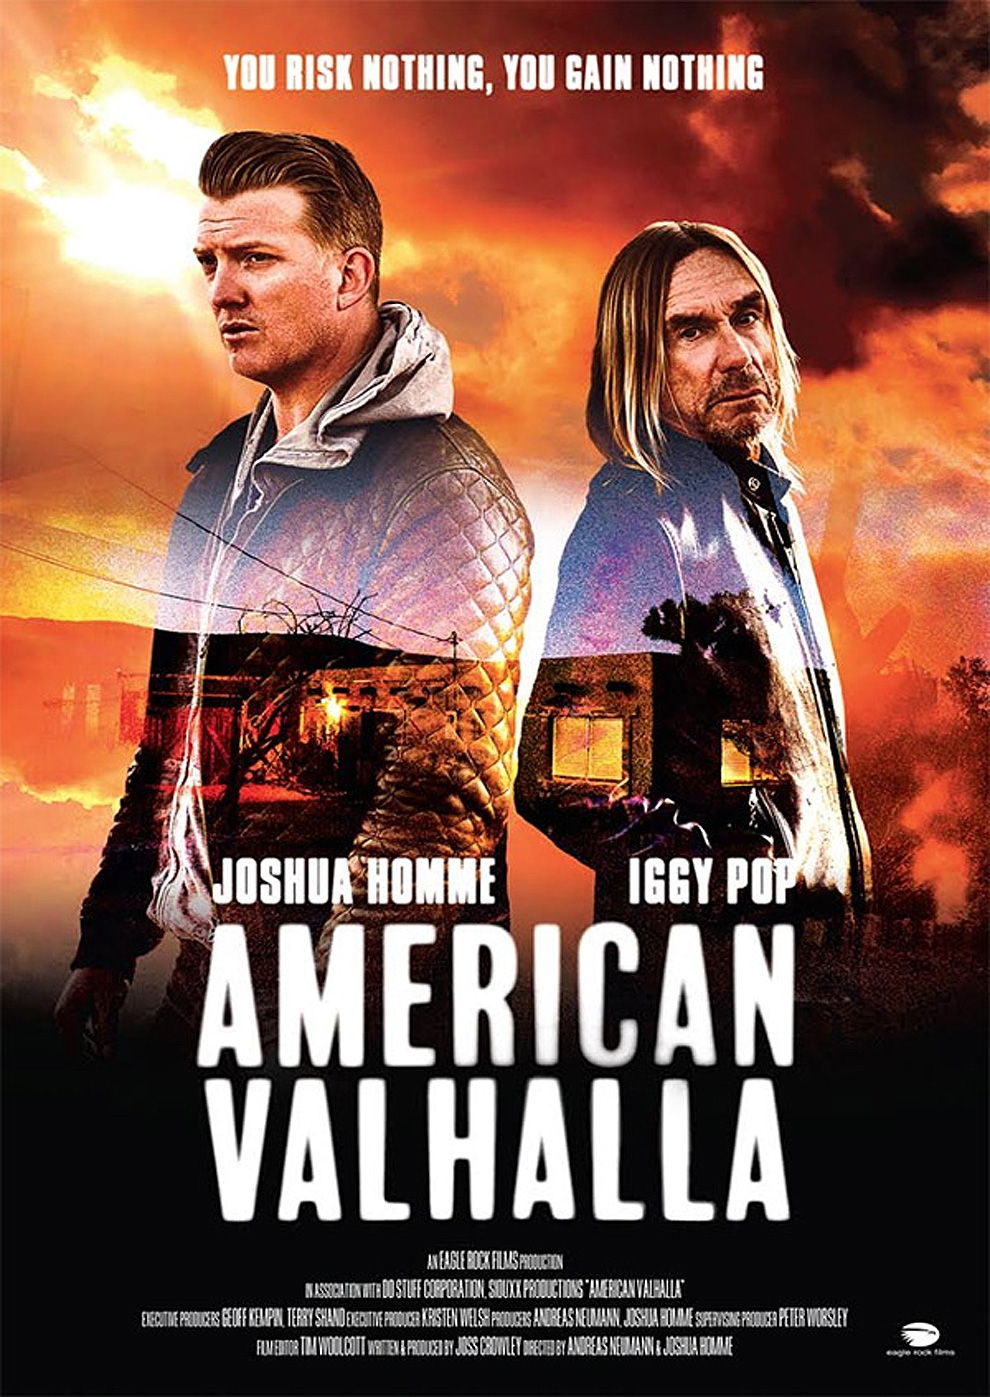 American Valhalla (Poster)